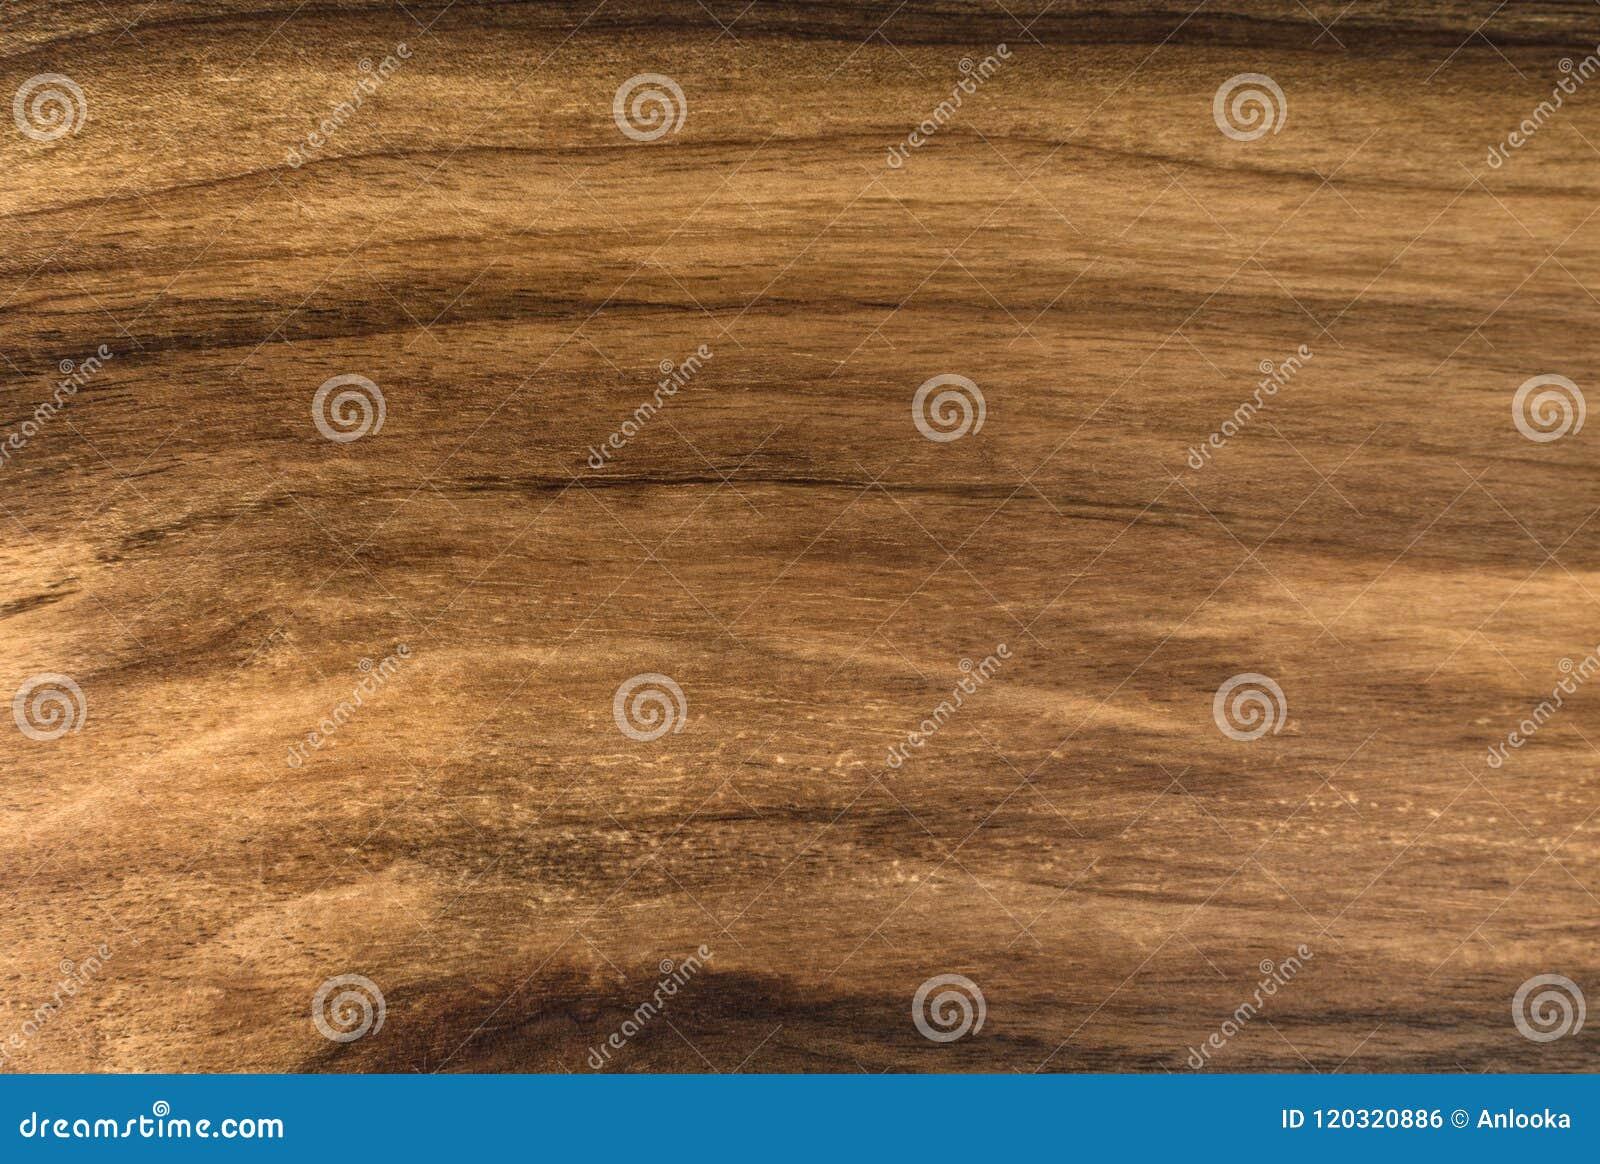 Walnut Wood Texture Brown Color Stock Photo Image Of Closeup